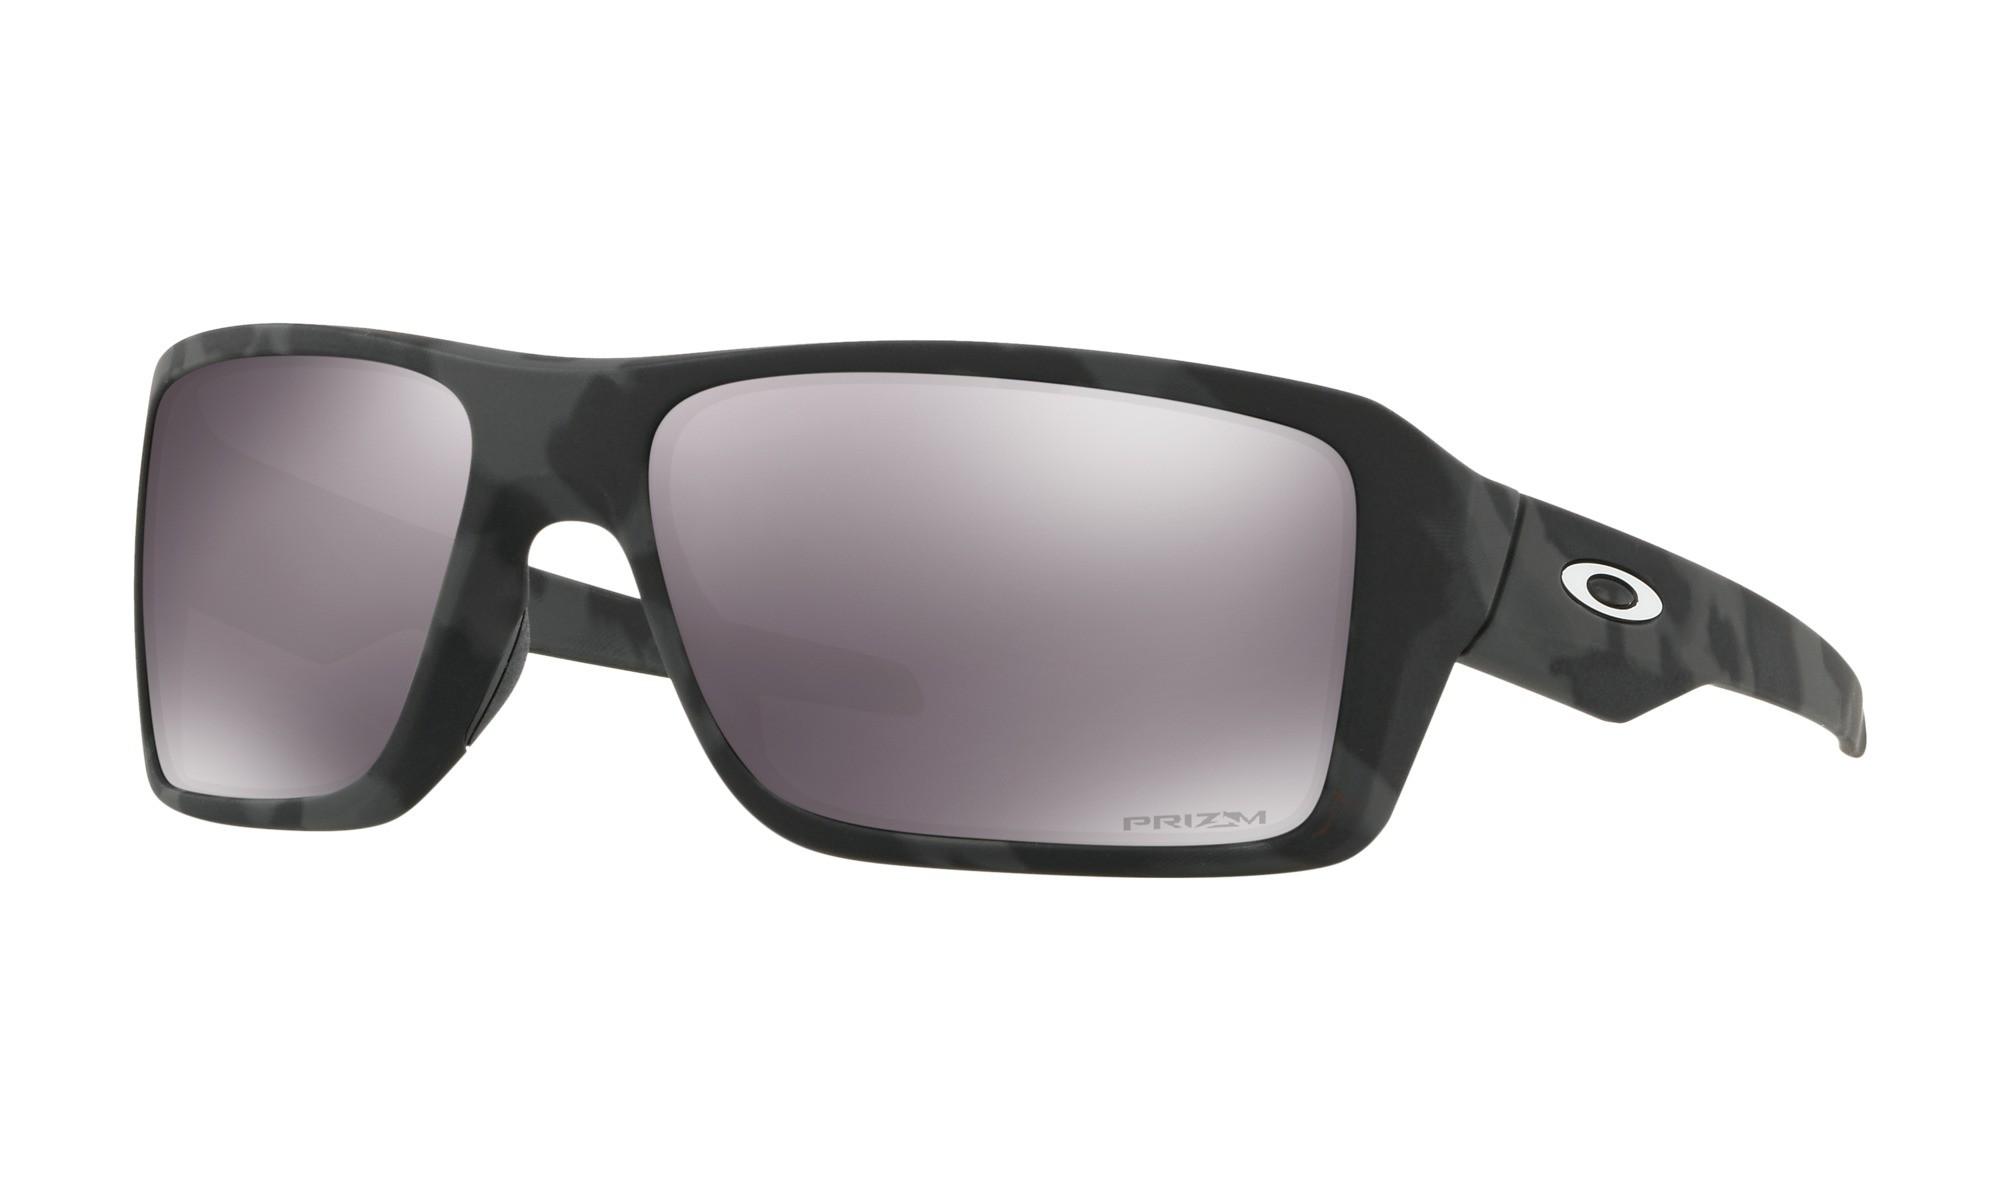 d0bbbda14c1 Oakley Double Edge Black Camo Collection Prizm Black Sunglasses